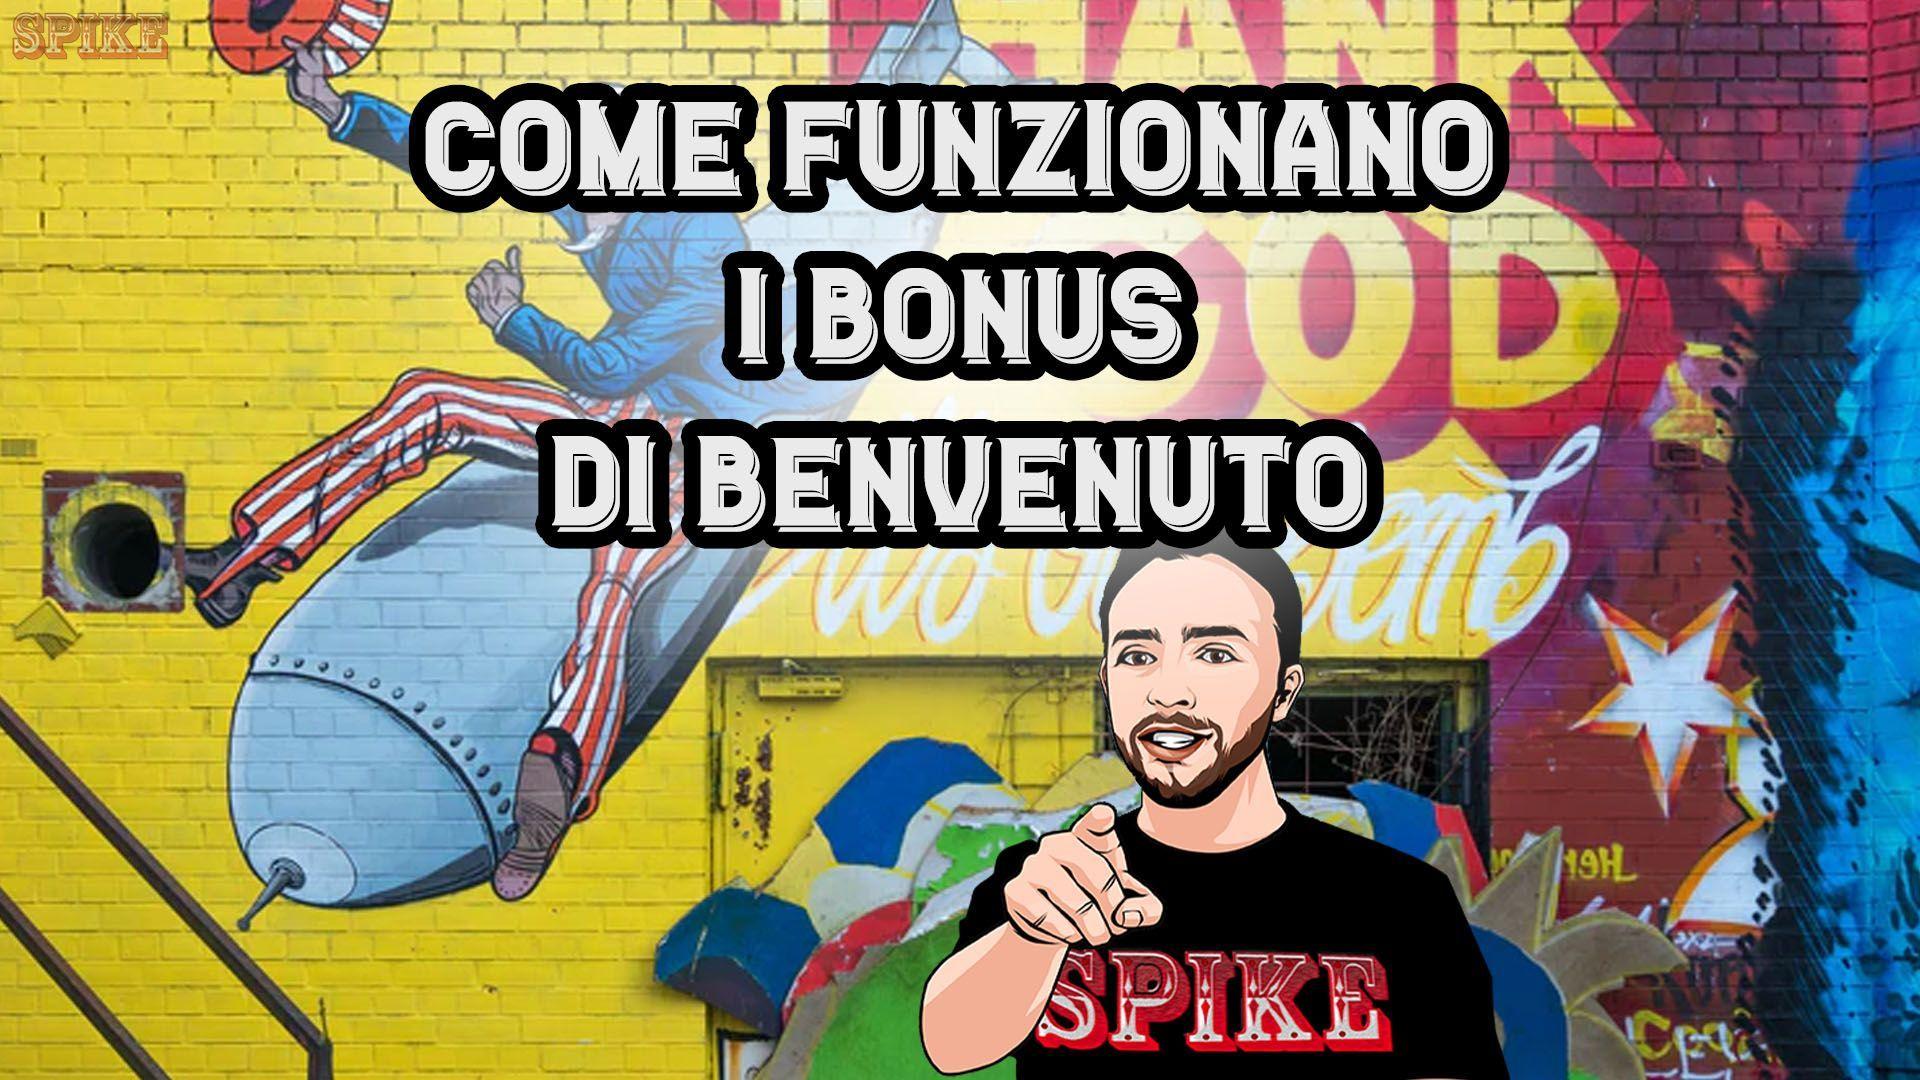 Guide e Trucchi ai Bonus di Casinò Online, Giochi Online e Consigli di SPIKE Slot Card